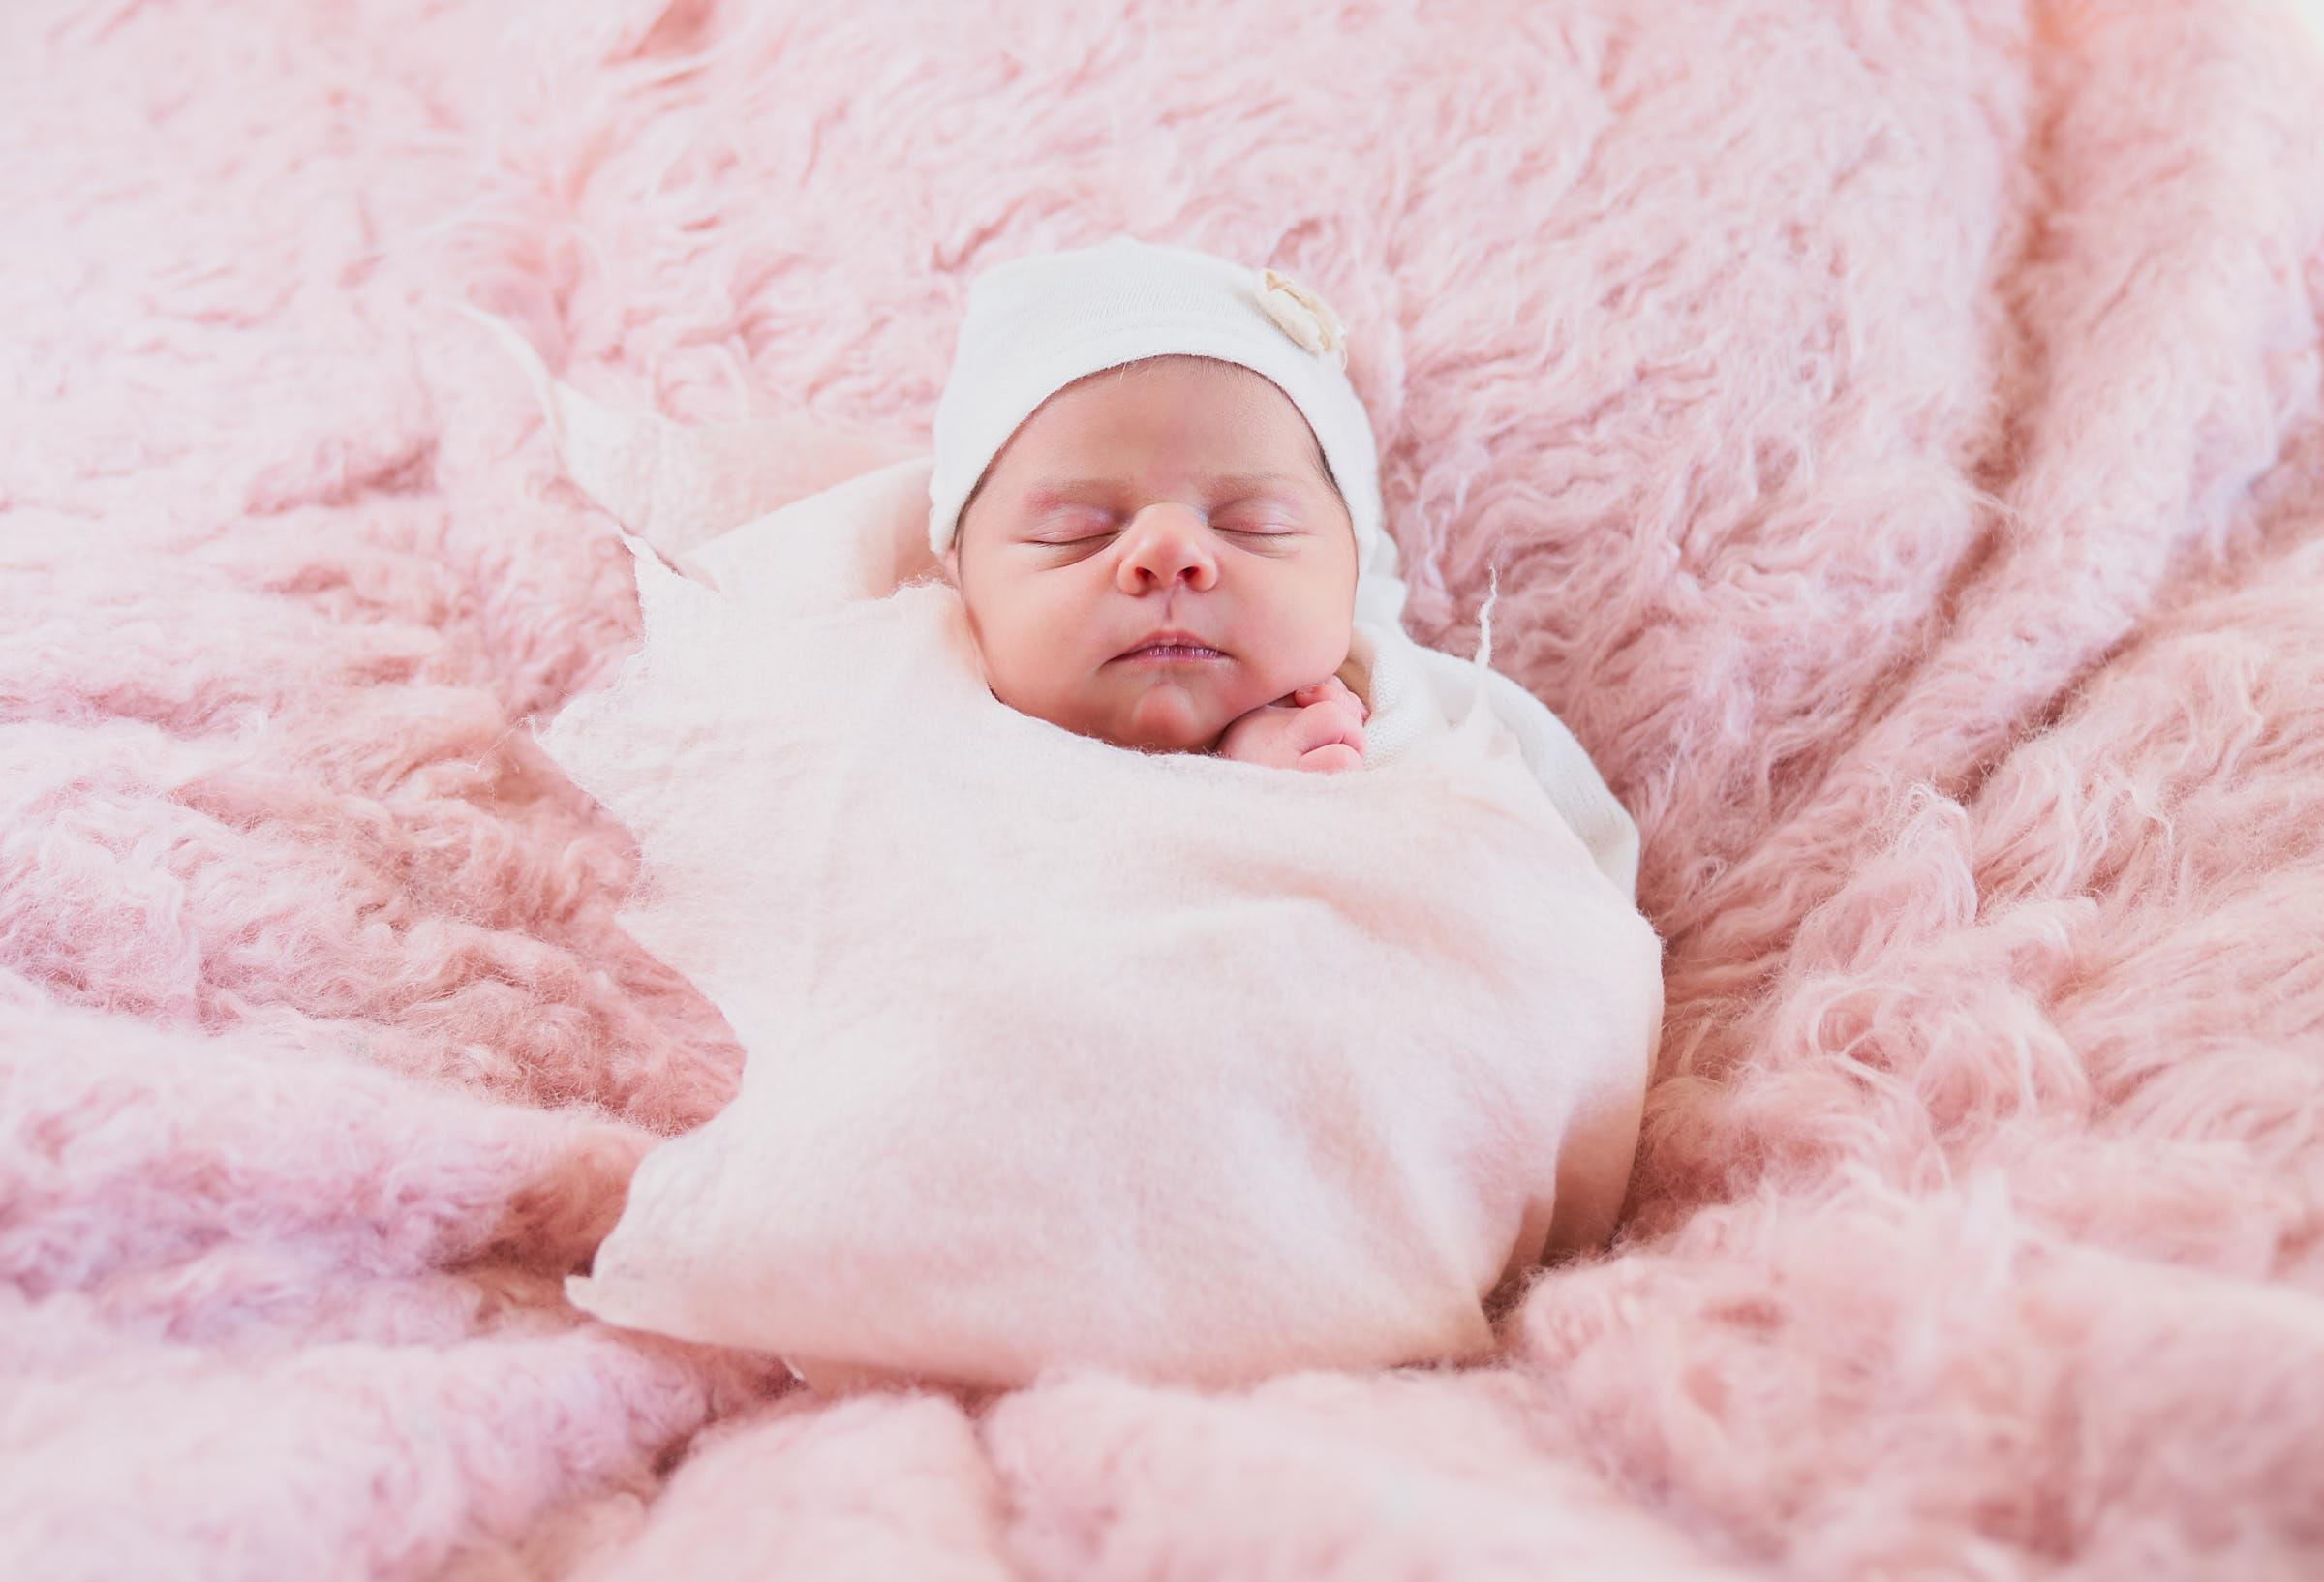 Afewgoodclicks In Home Newborn Photographer Pink Wraps